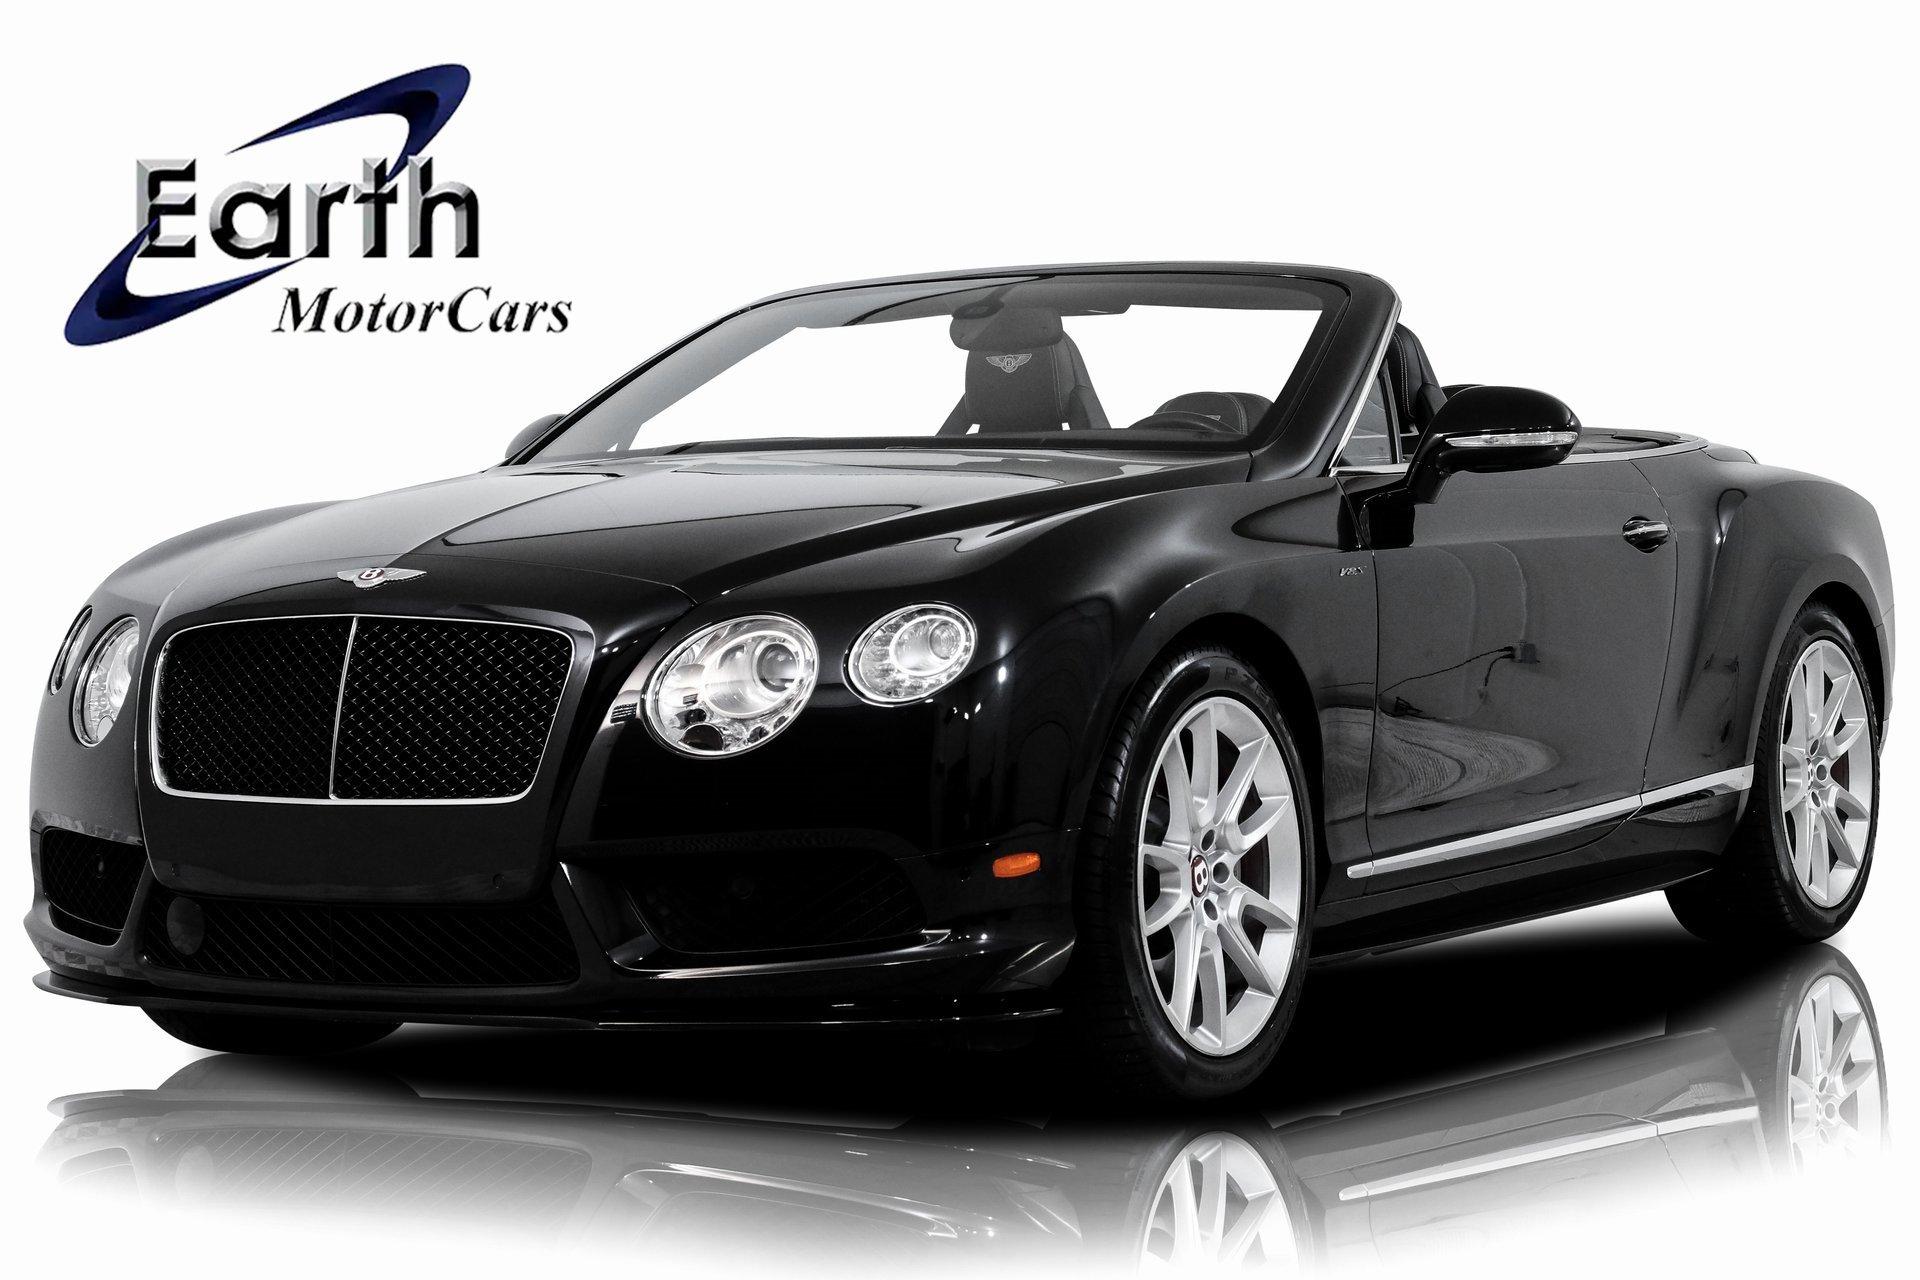 2014 Bentley Continental GT V8 S Convertible image